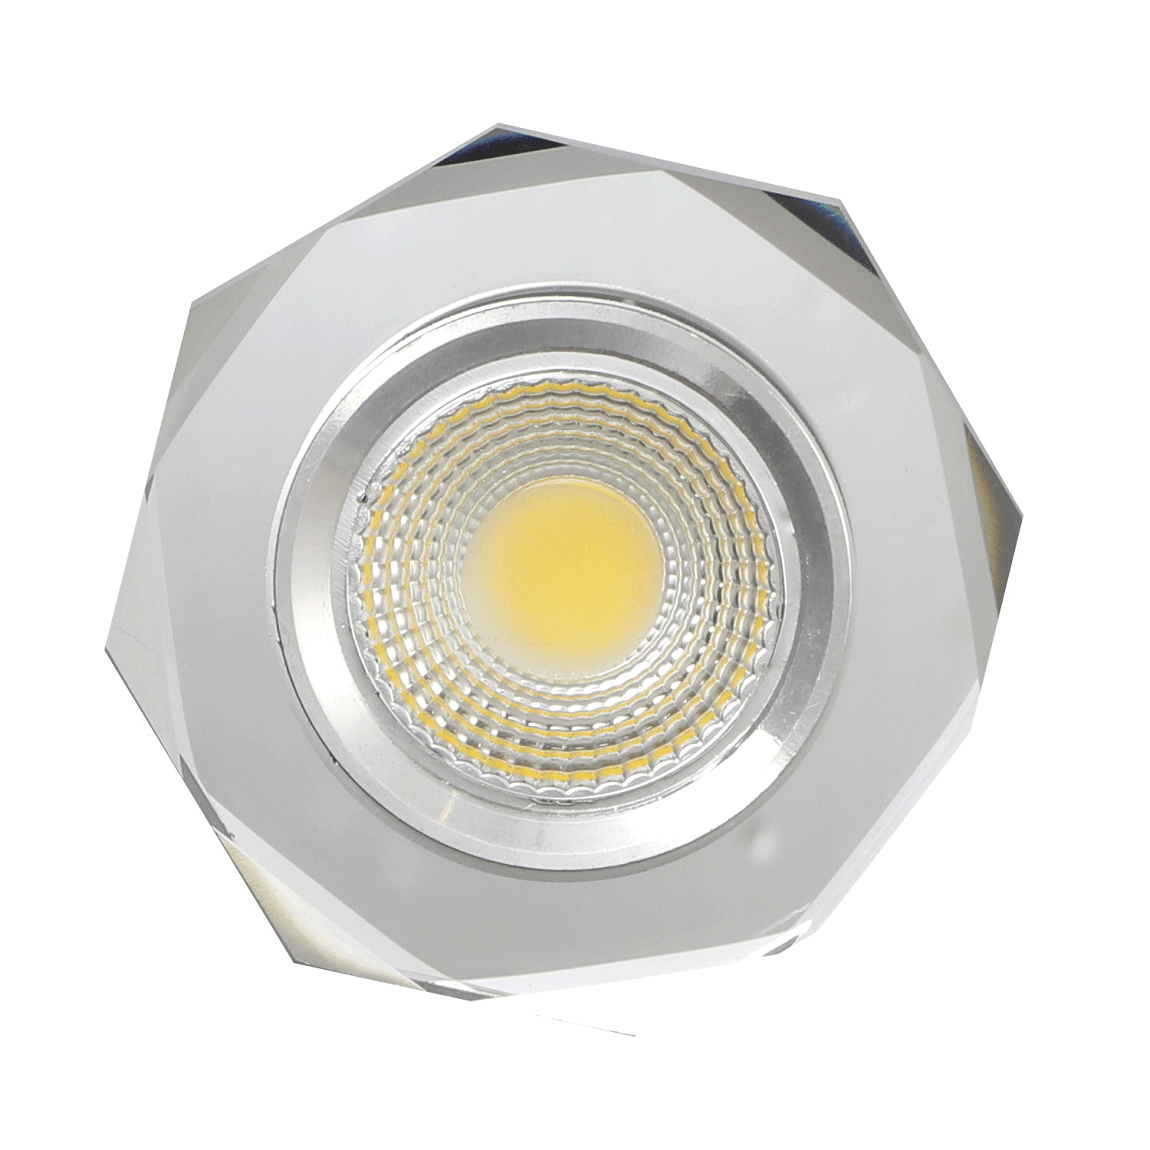 FORLIFE FL-1829 - 5 Watt Kristal LED Spot